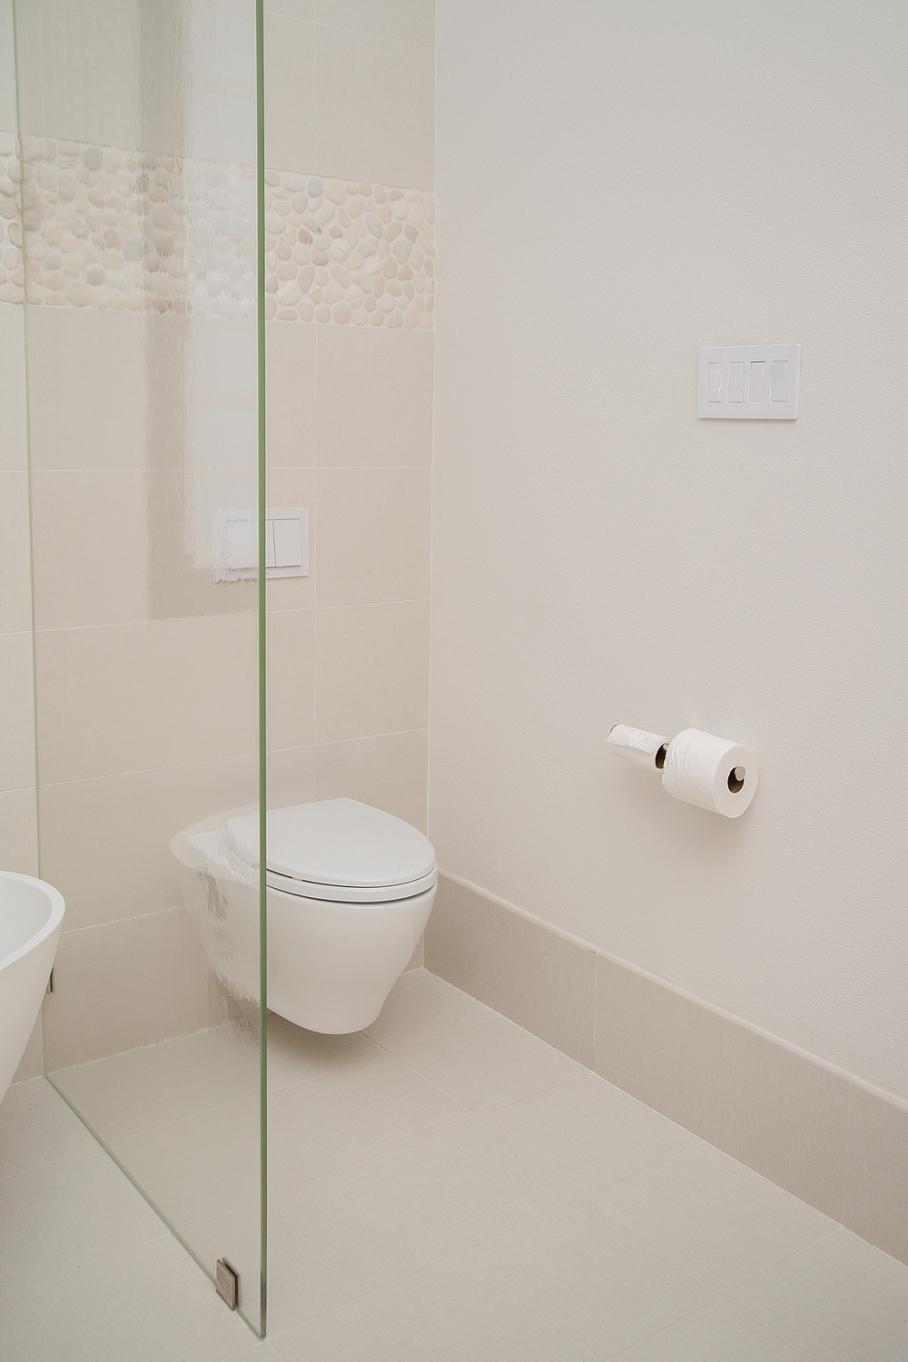 Master bathroom remodel; Toto toilet / comode| Interior Designer: Carla Aston / Photographer: Tori Aston